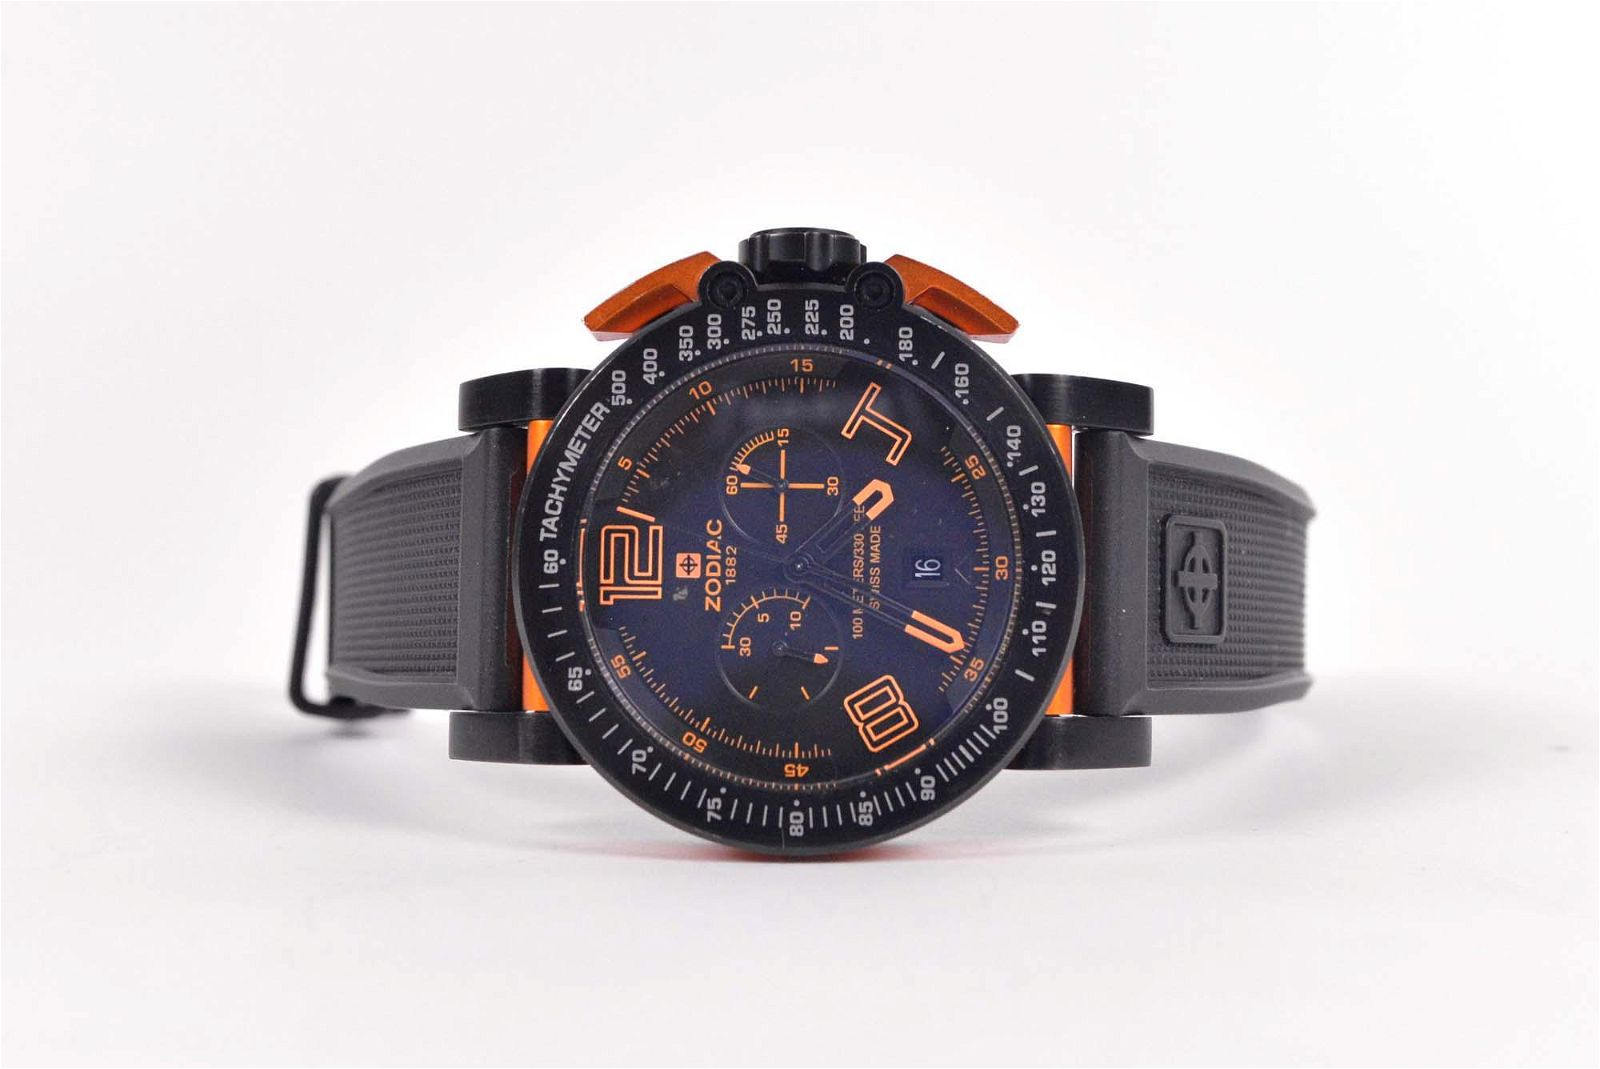 Zodiac - Men's chronometer and tachymeter ZMX-02 watch